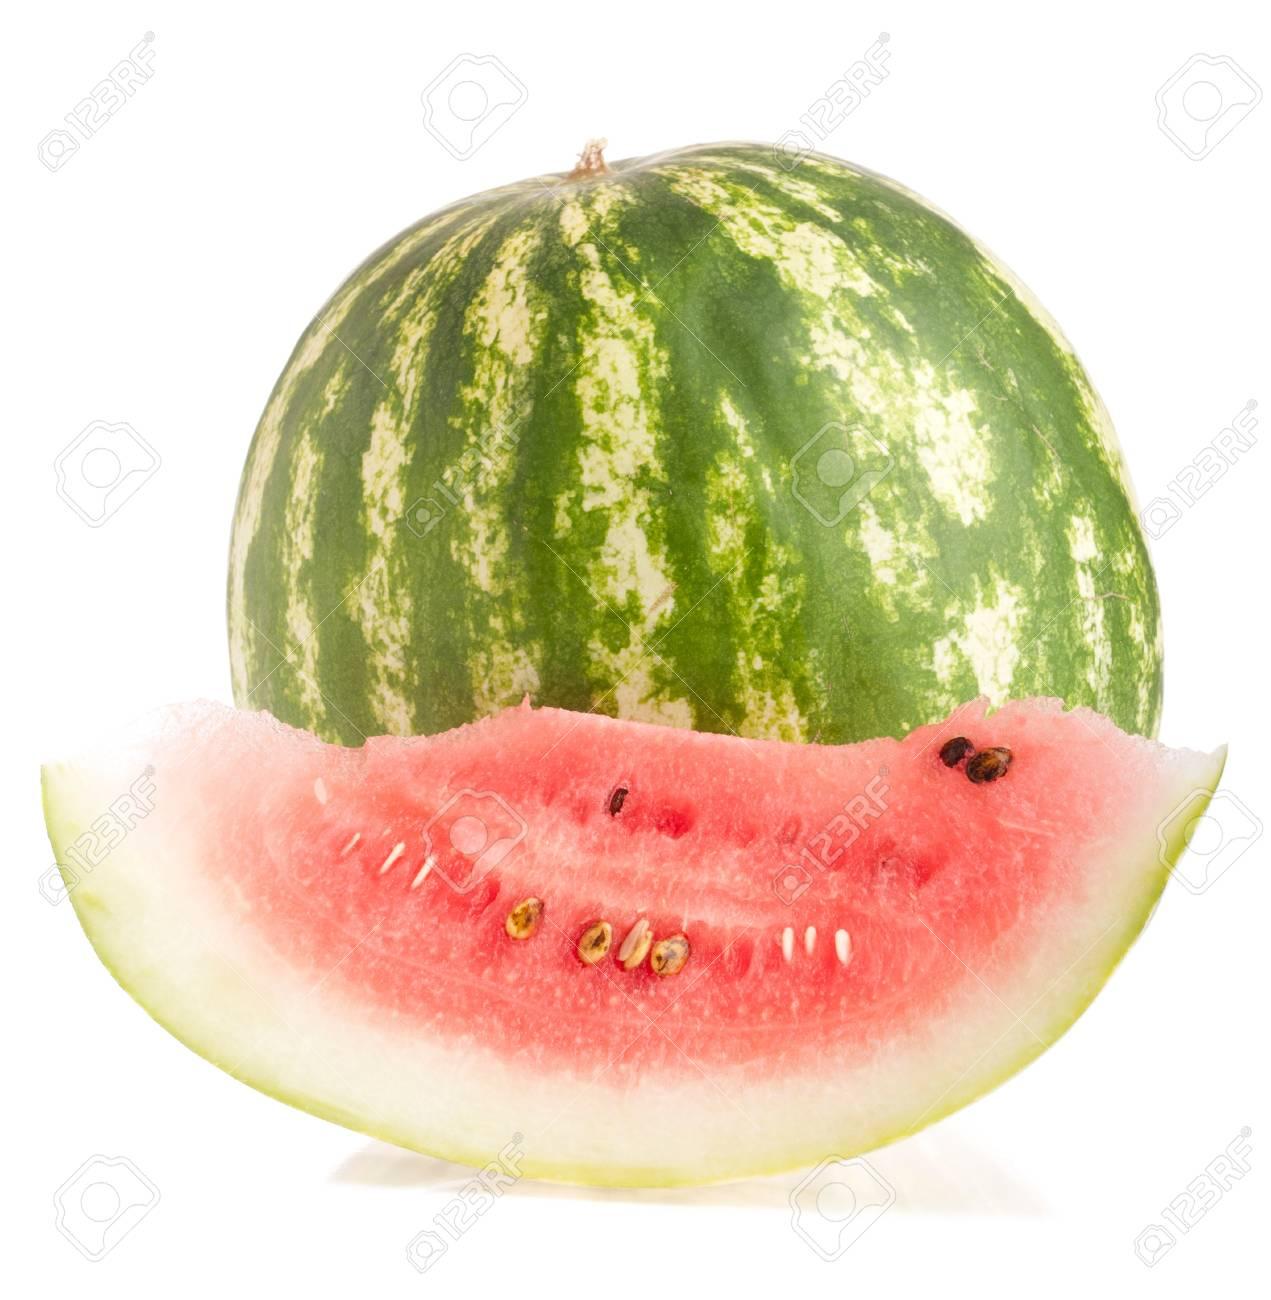 whole and slice watermelon fruit (isolated on white background) Stock Photo - 9966742